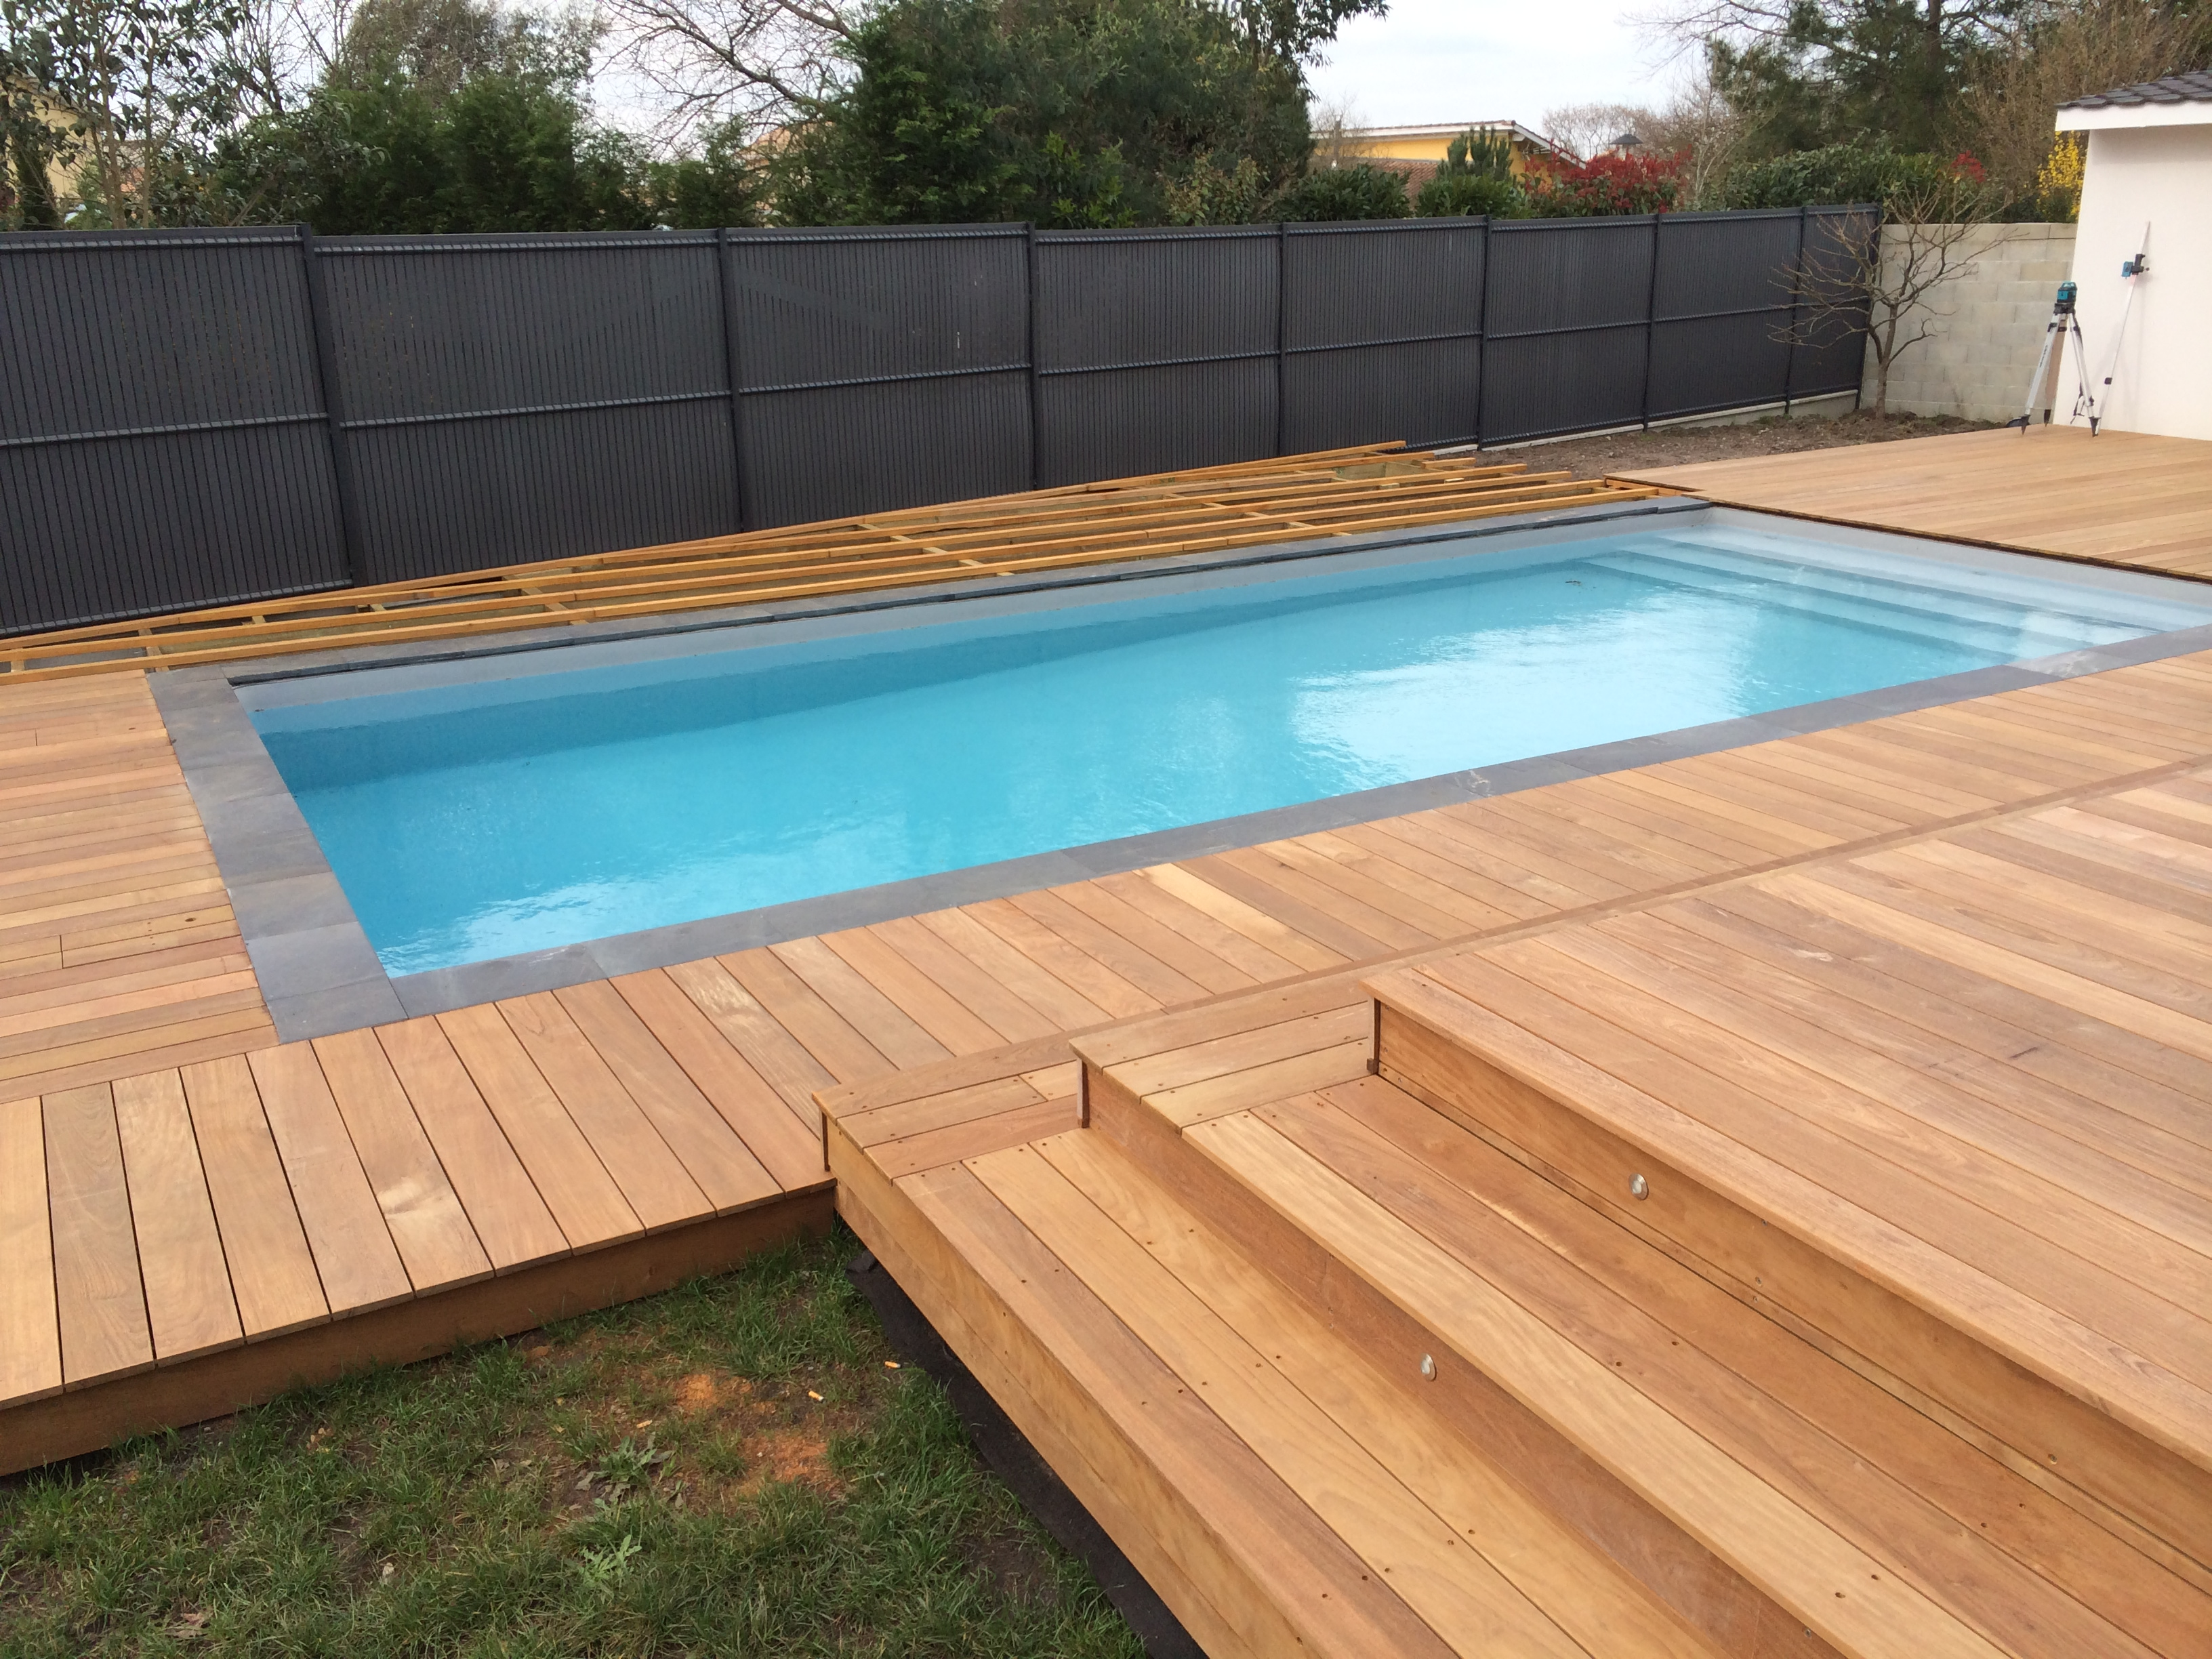 Terrasse-tour-de-piscine-bois-ipe-bouscat